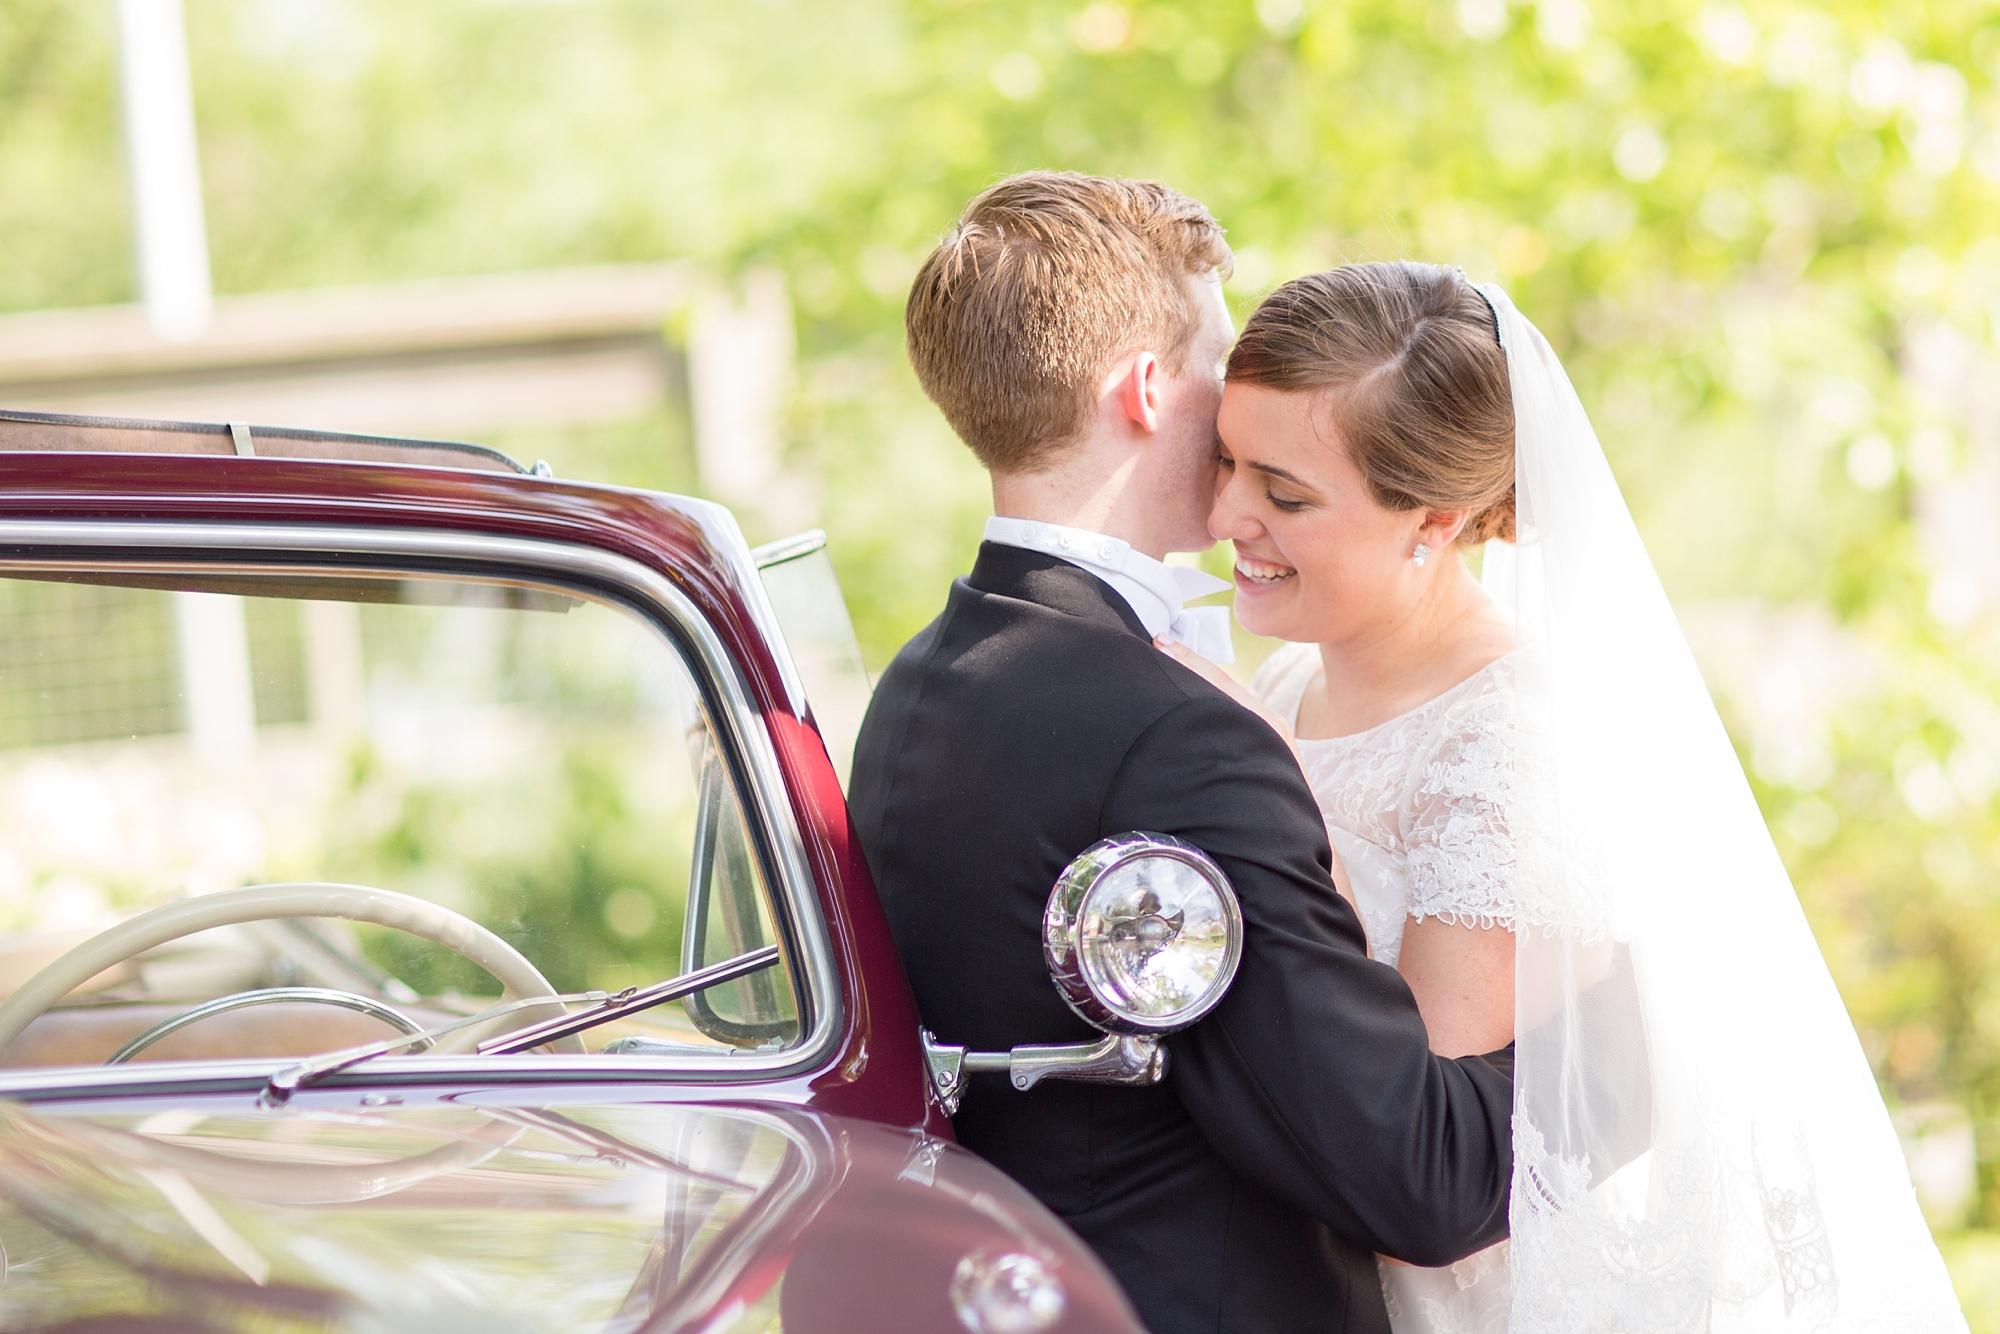 Somerville 4-Bride & Groom Portraits-1184_anna grace photography sherwood forest annapolis maryland wedding photographer photo.jpg